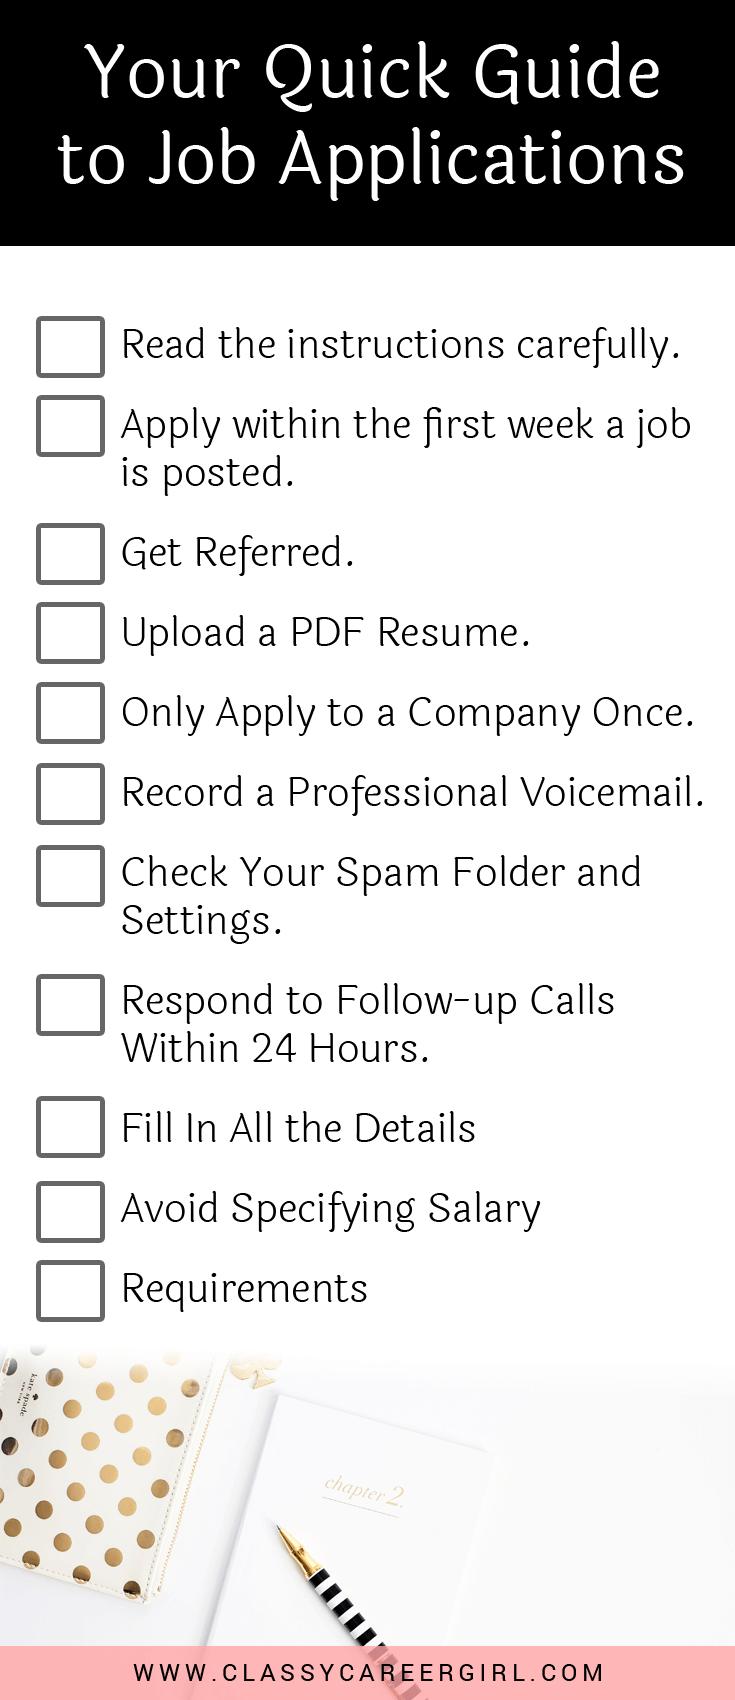 A Quick Guide To Online Job Applications Online Job Applications